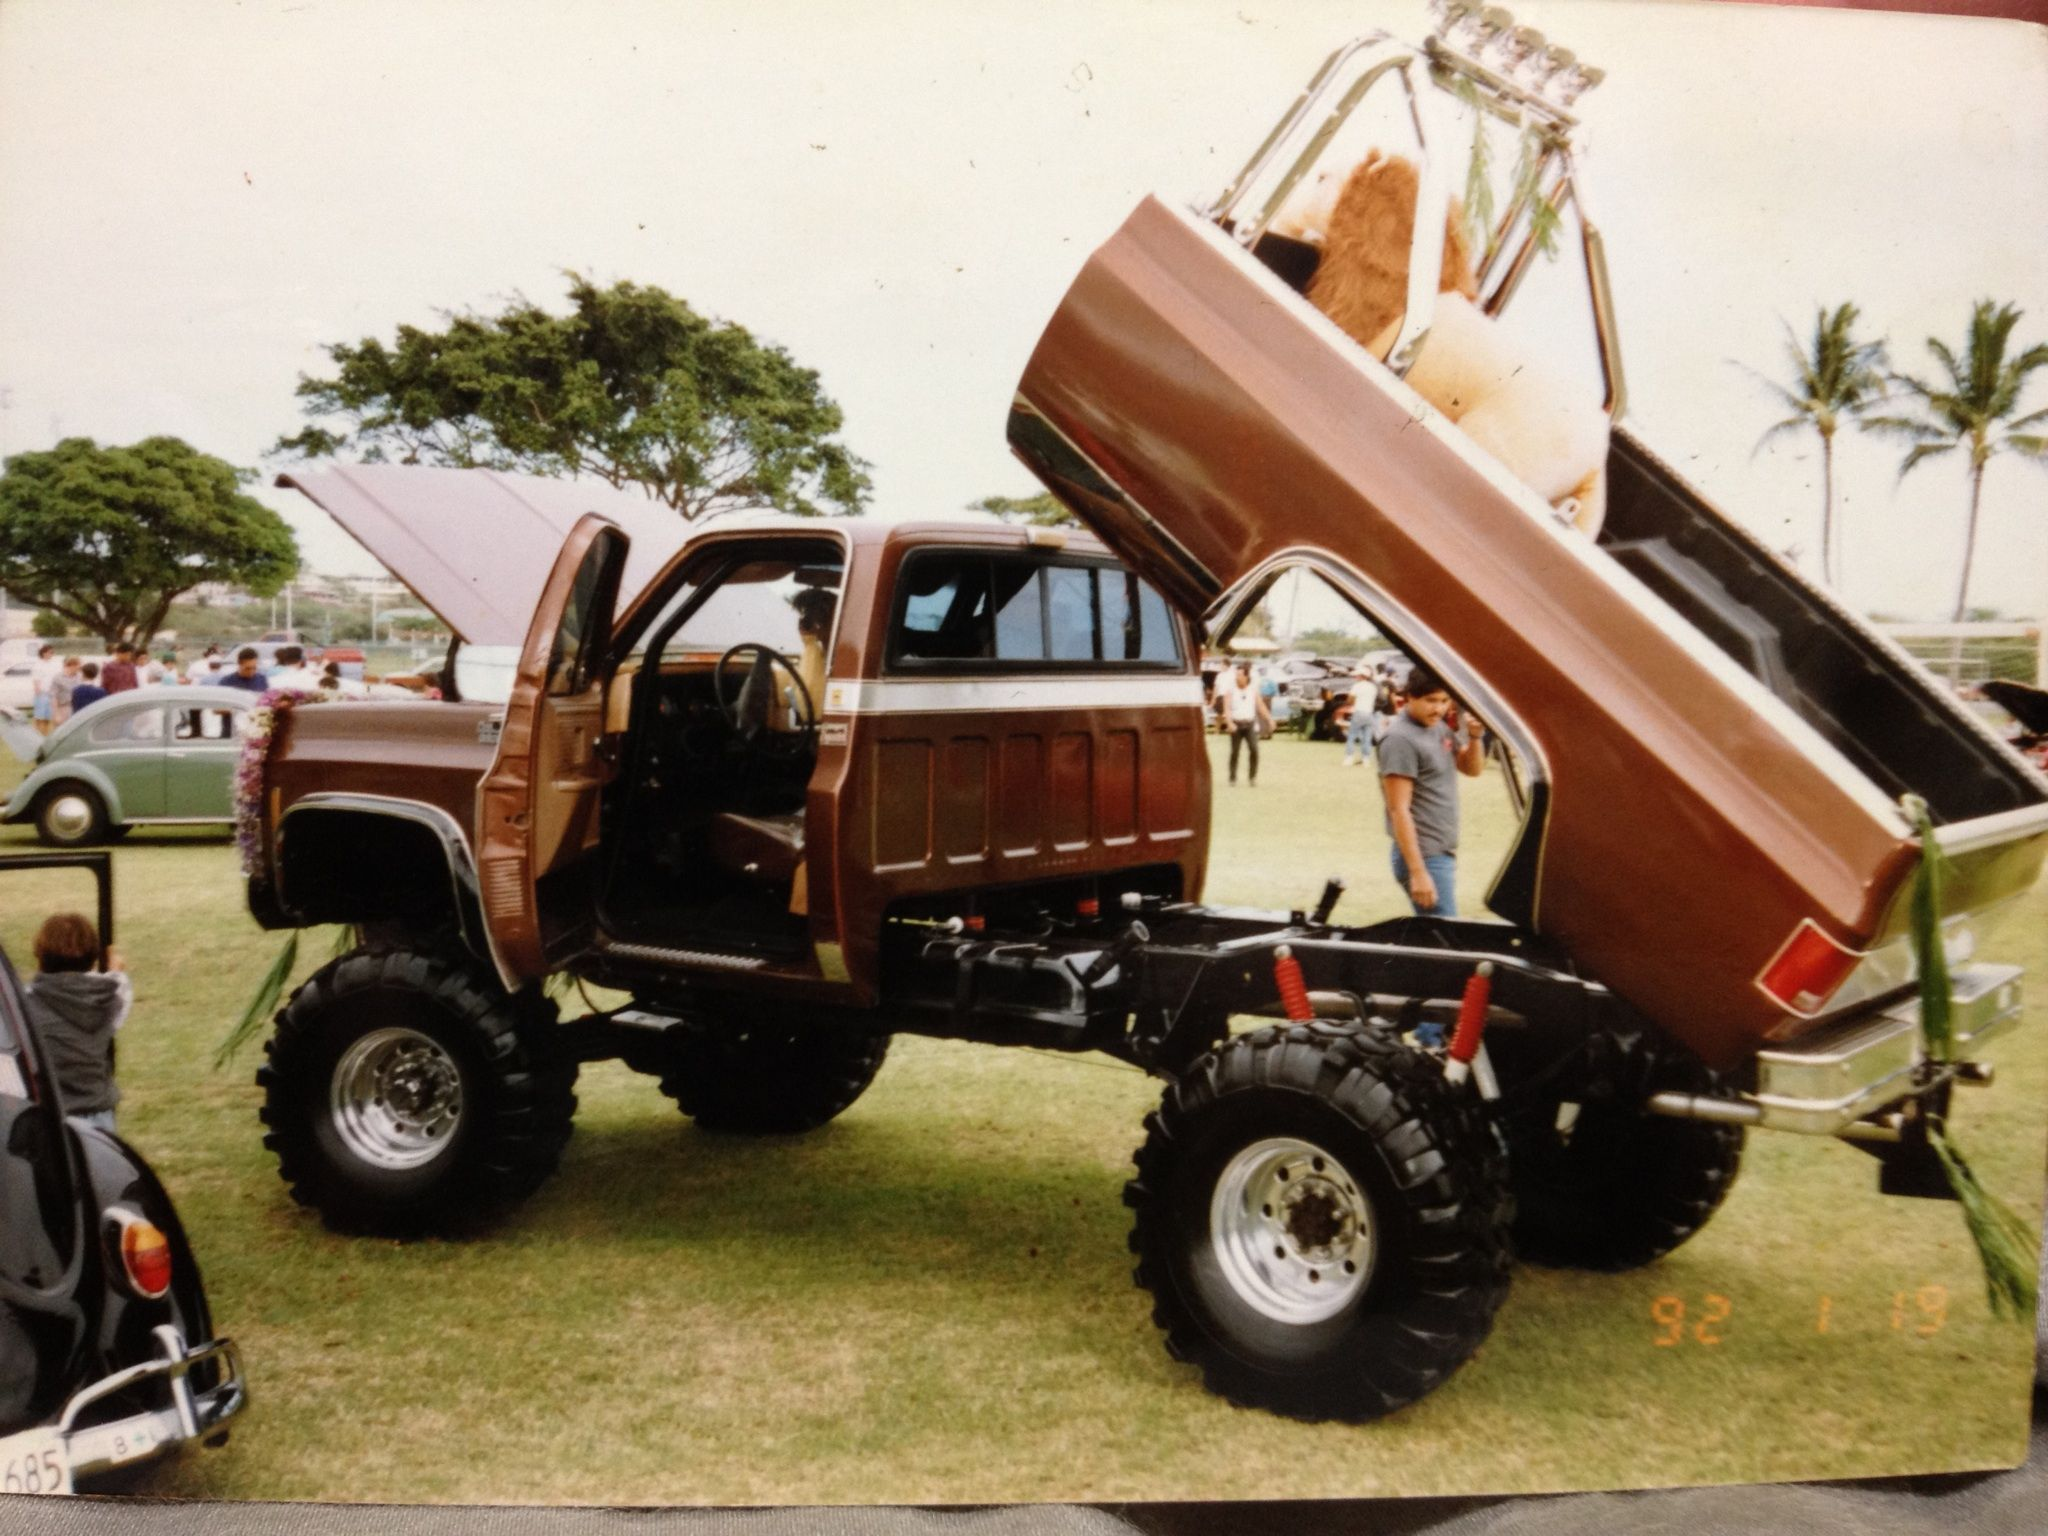 Car Show Chevy Truck X Hawaii HI Truckn Pinterest X - Car show hawaii